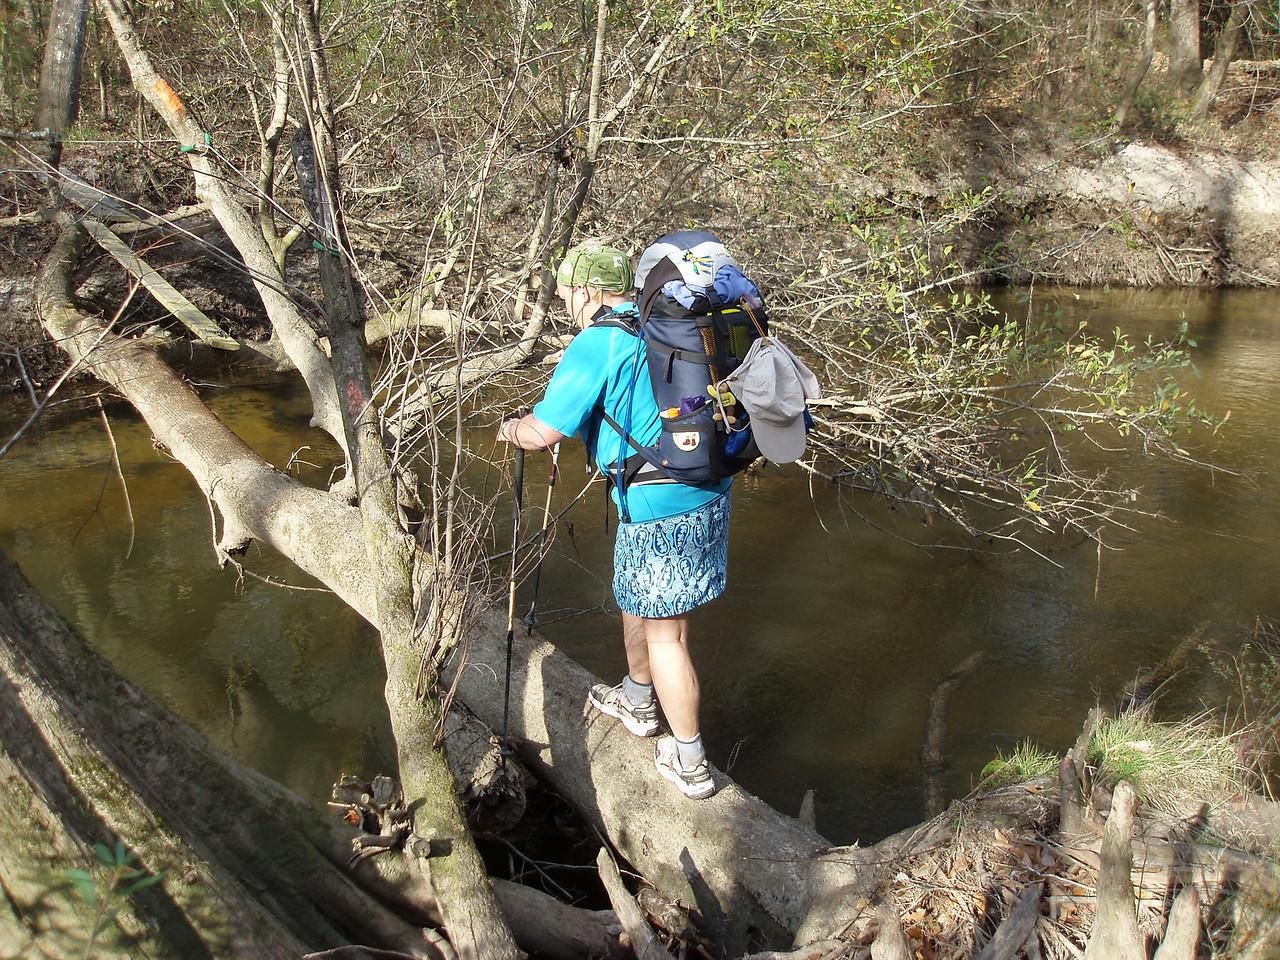 Difficult creek crossing<br /> PHOTO CREDIT: Robert Coveney / Florida Trail Association